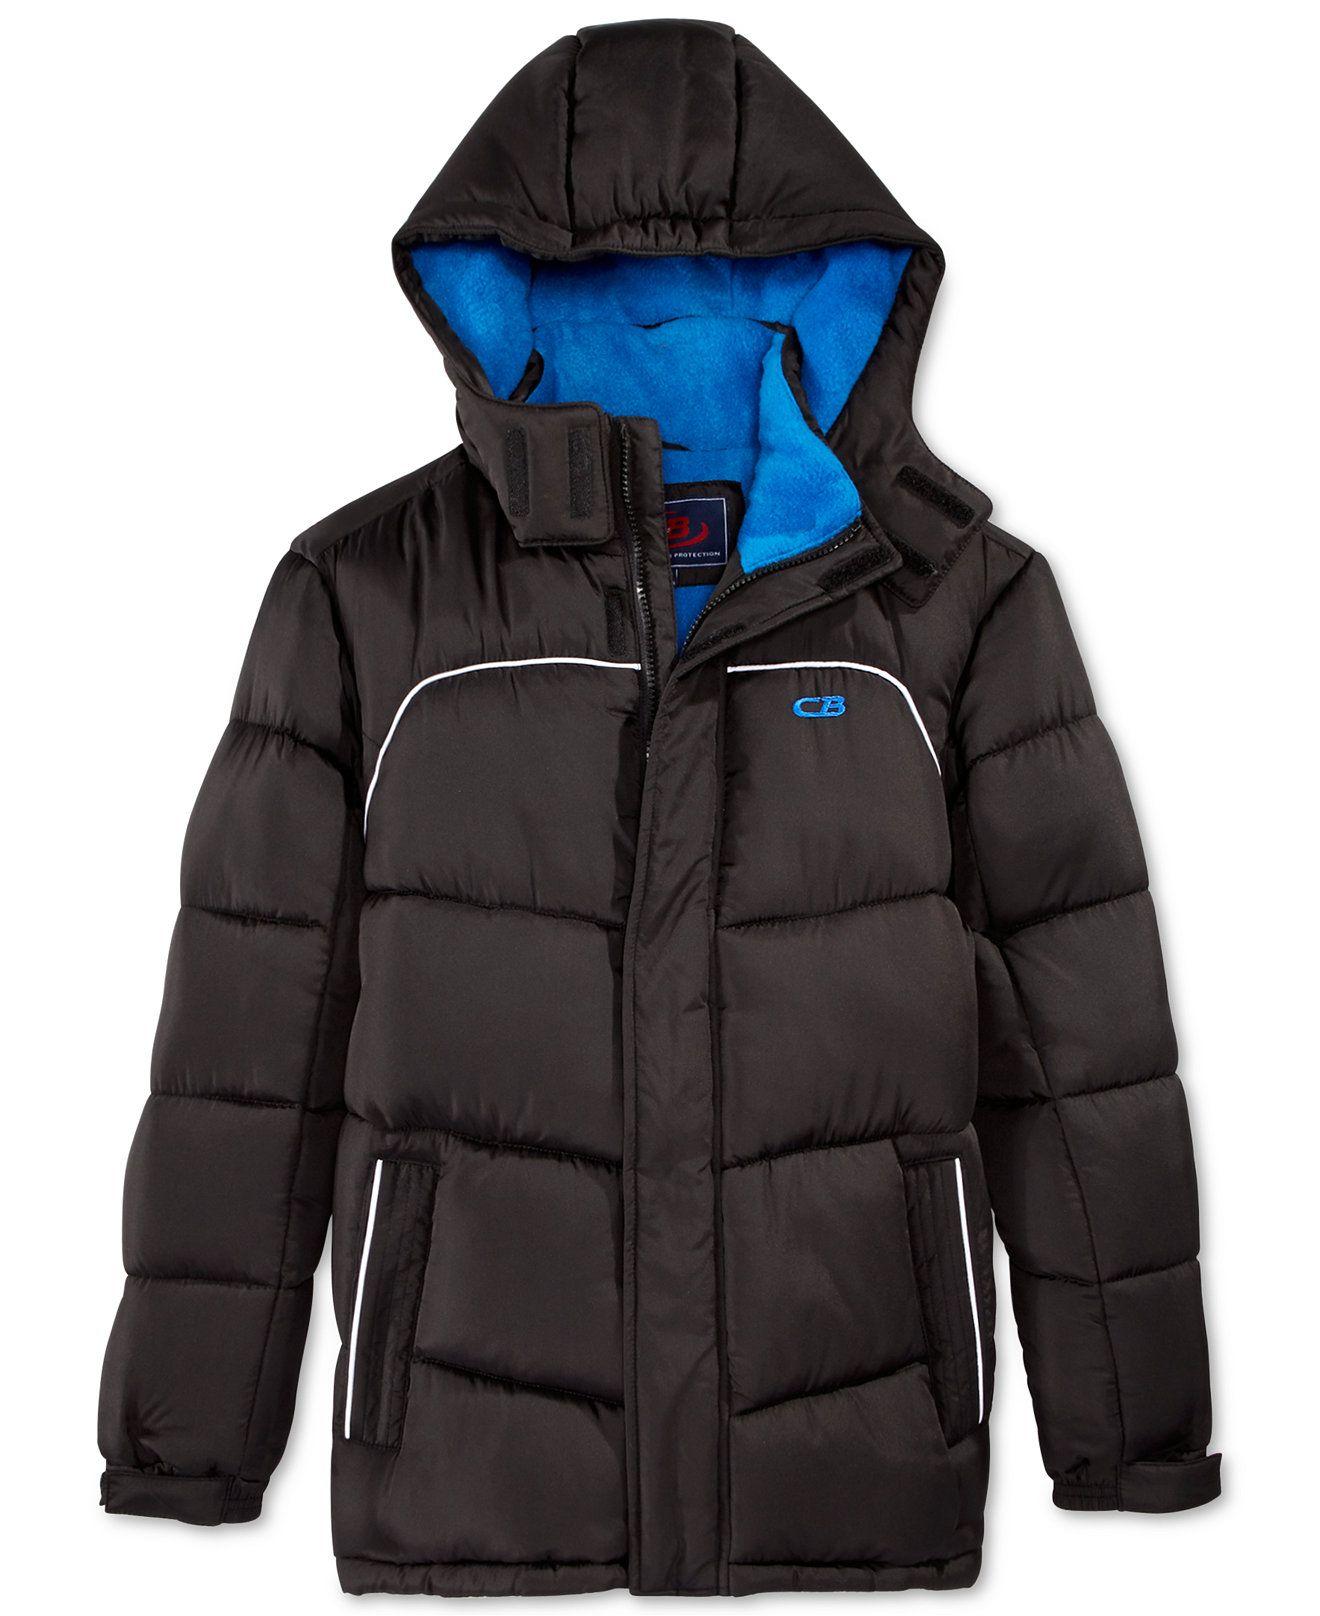 Cb Sport Boys Puffer Coat Kids Baby Macy S Puffer Coat Kids Coats Boy Puffer Coat [ 1616 x 1320 Pixel ]